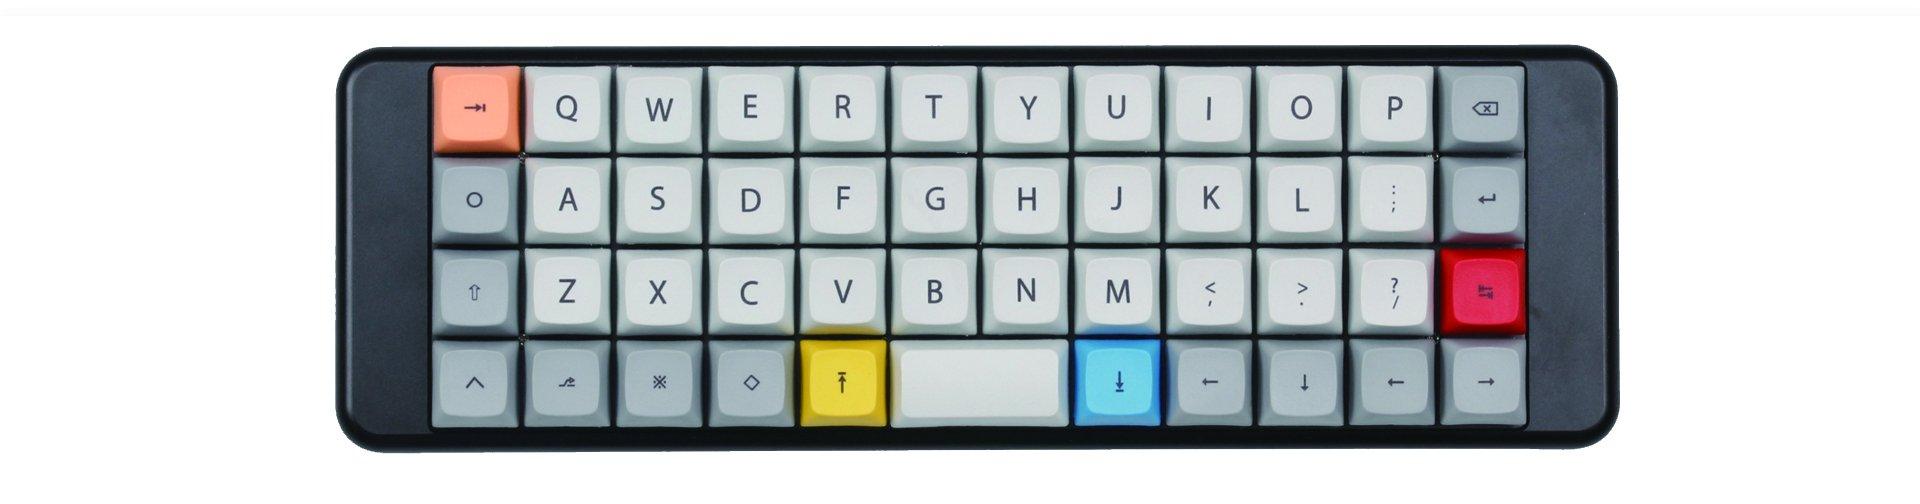 GB]Double2 BLE RGB 40% Custom mechanical keyboard diy kit - Group